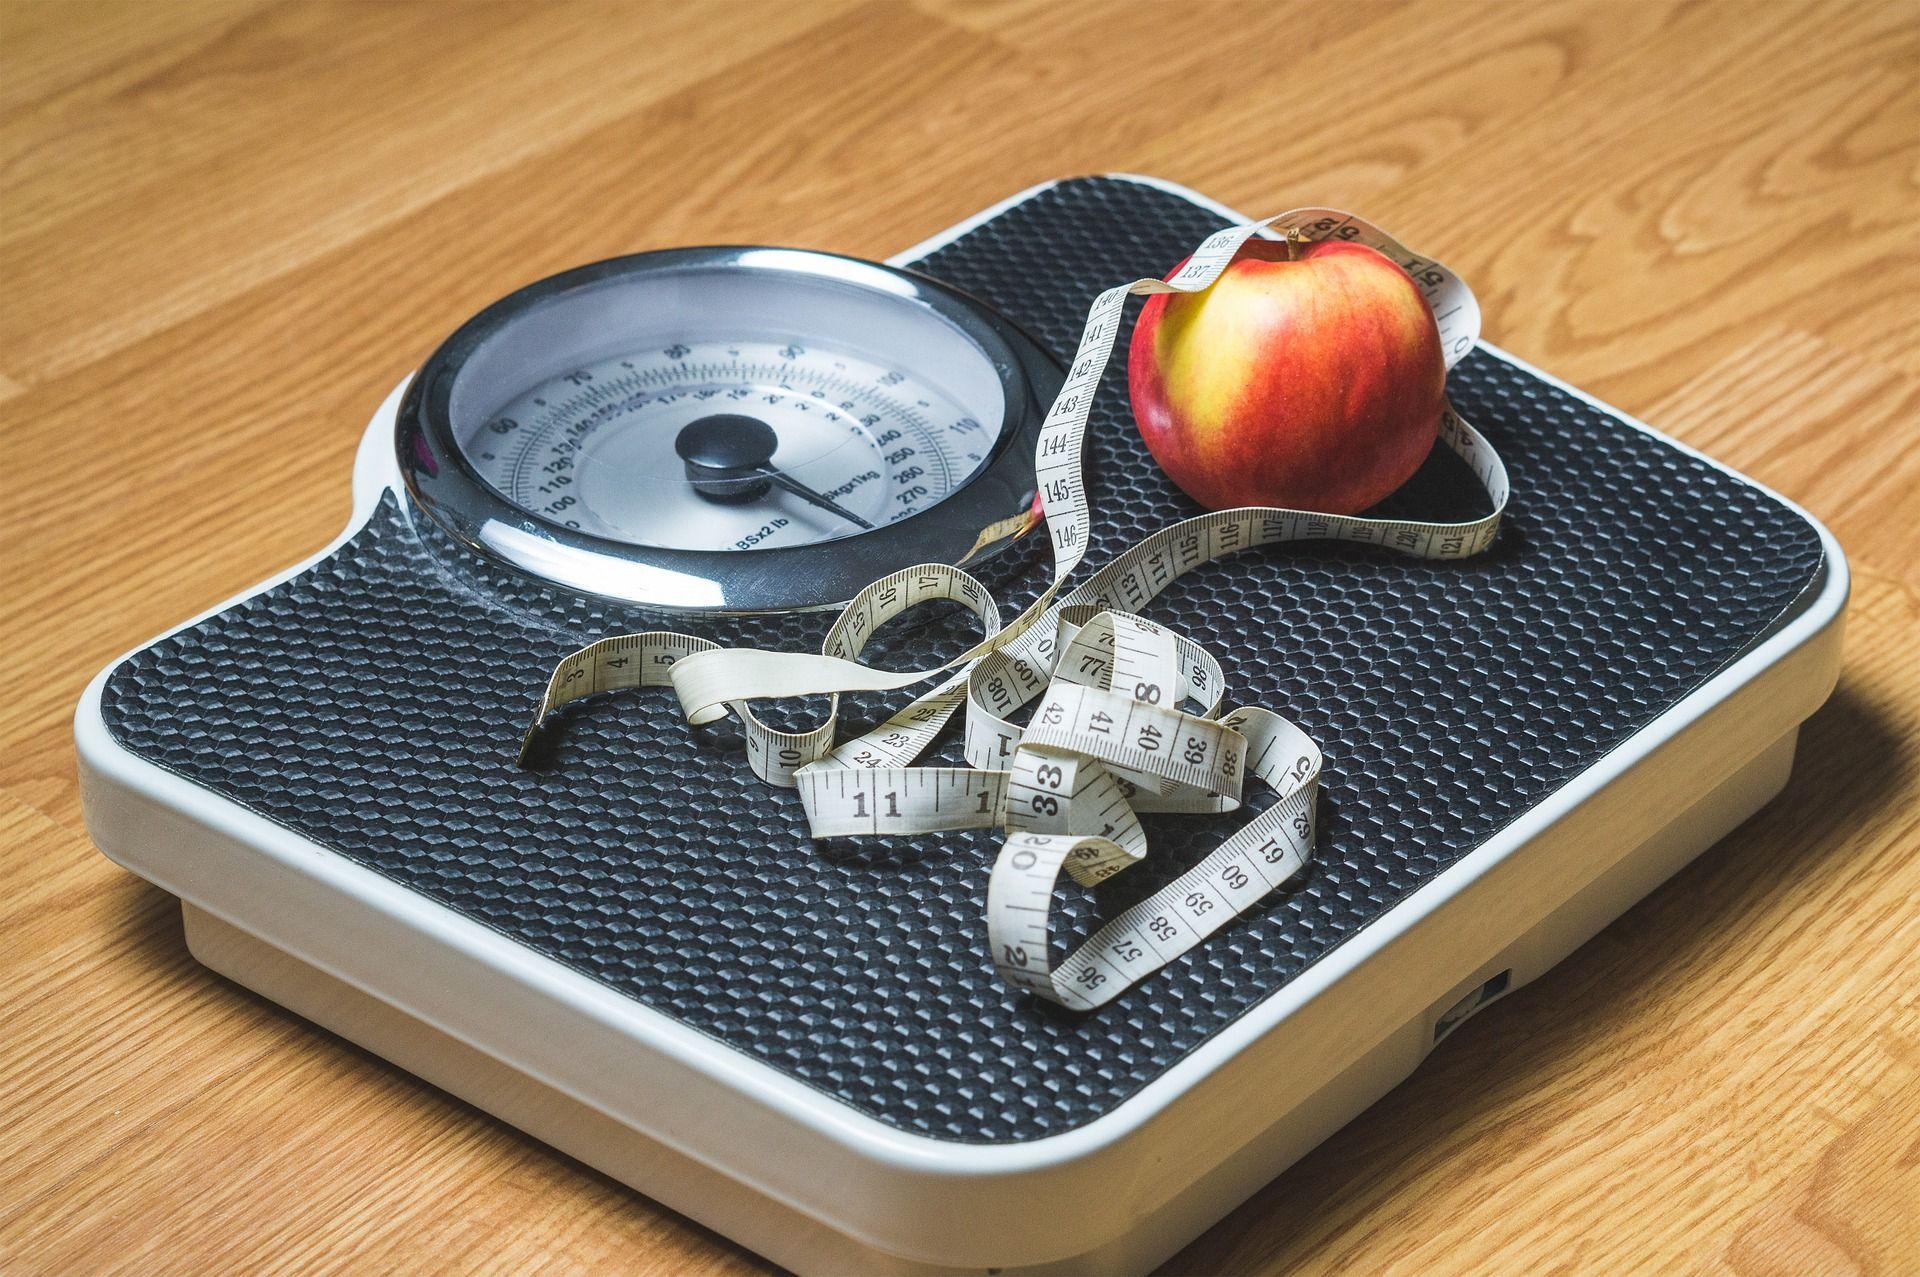 aceptarse-resignarse-obesidad-sobrepeso-kilos